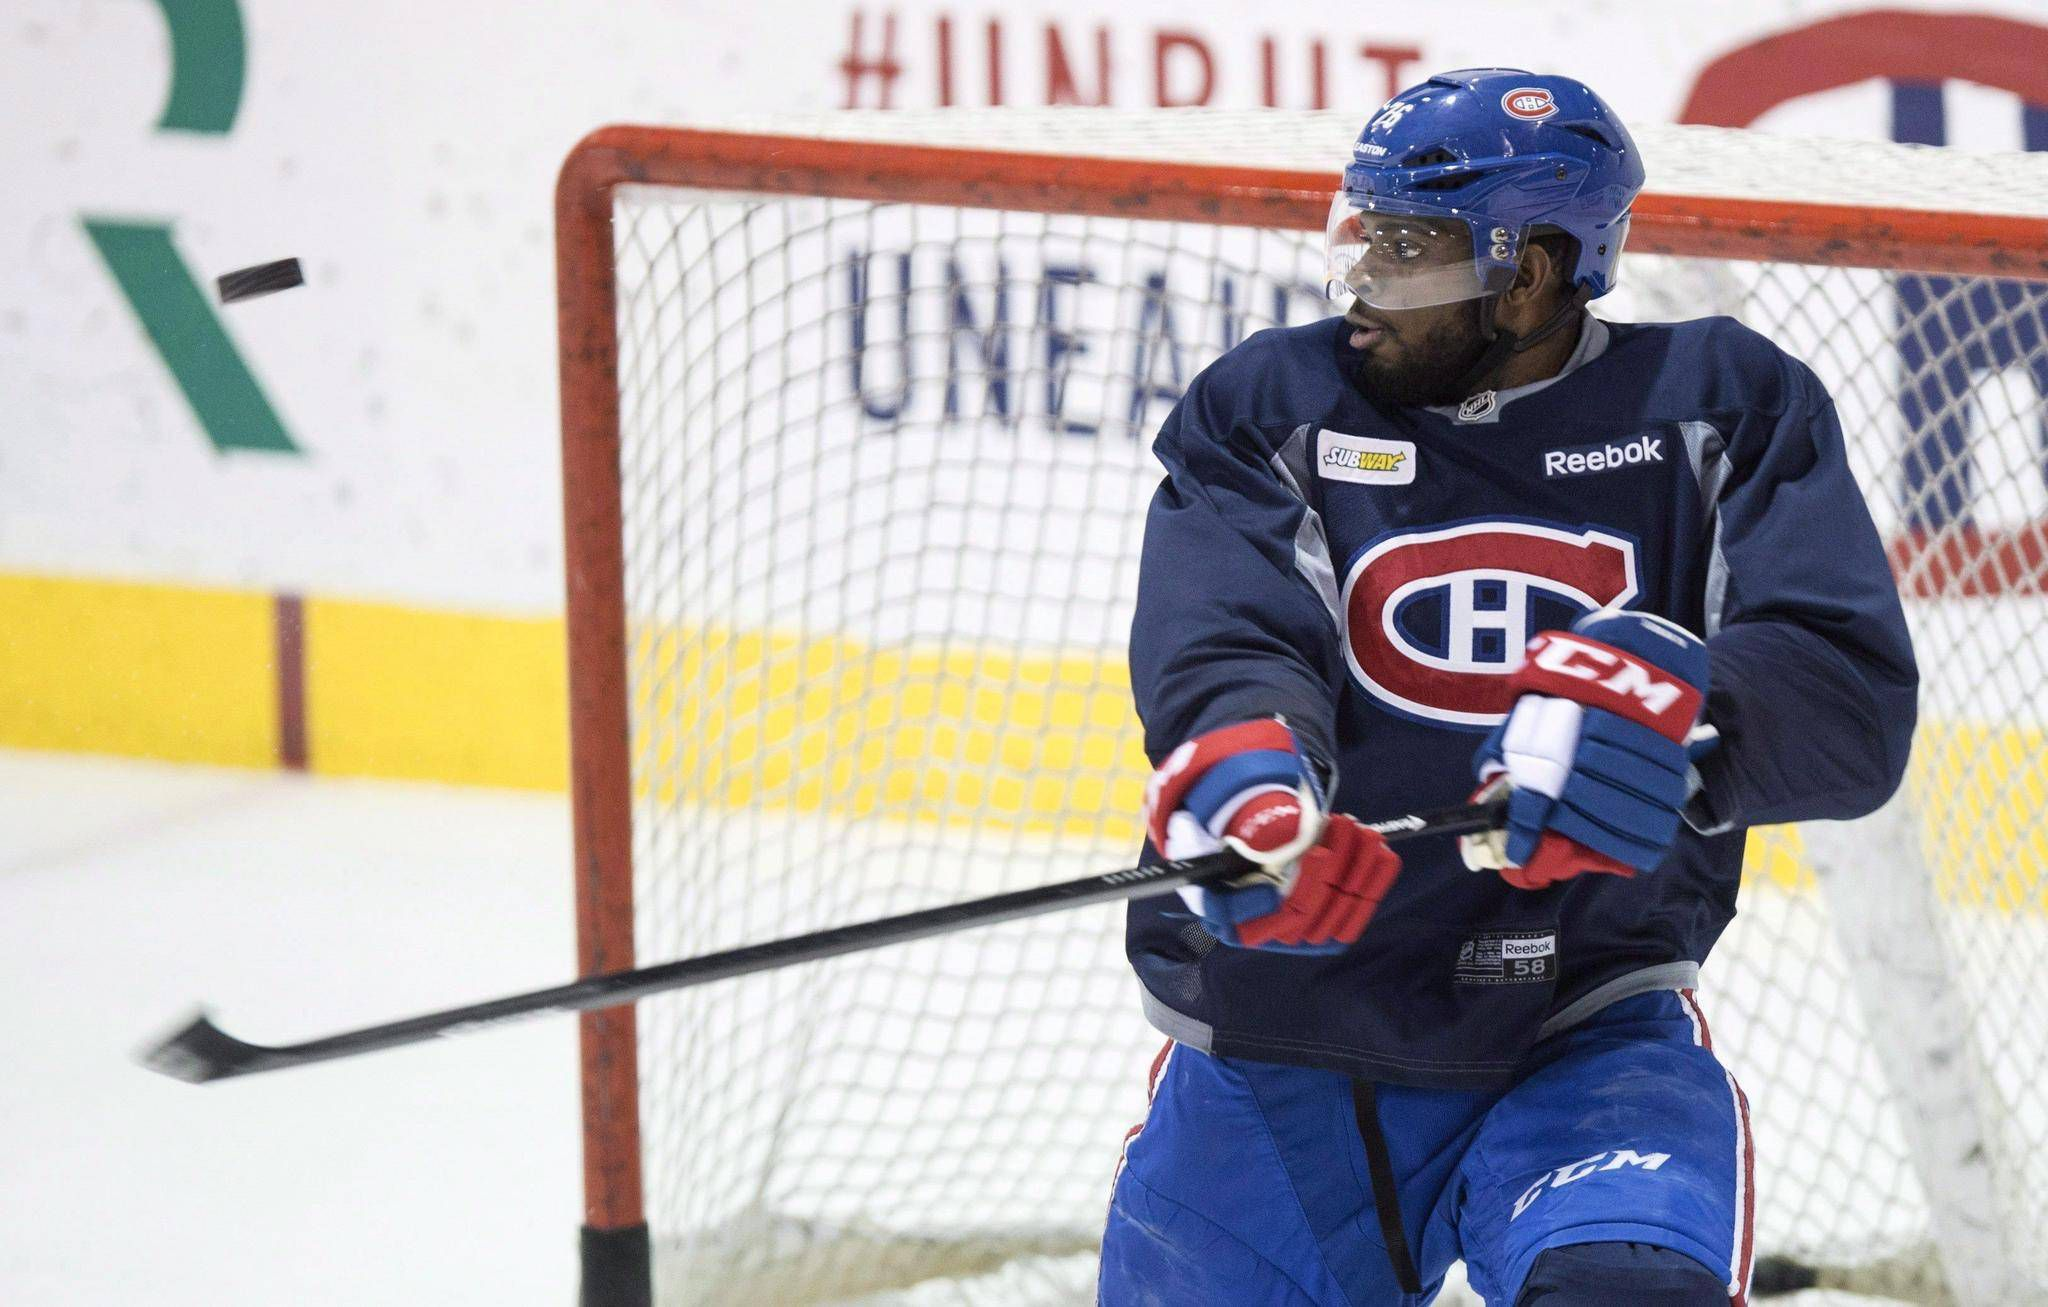 598ac01fcfa Canadiens trade P.K. Subban to Predators for Shea Weber in blockbuster deal